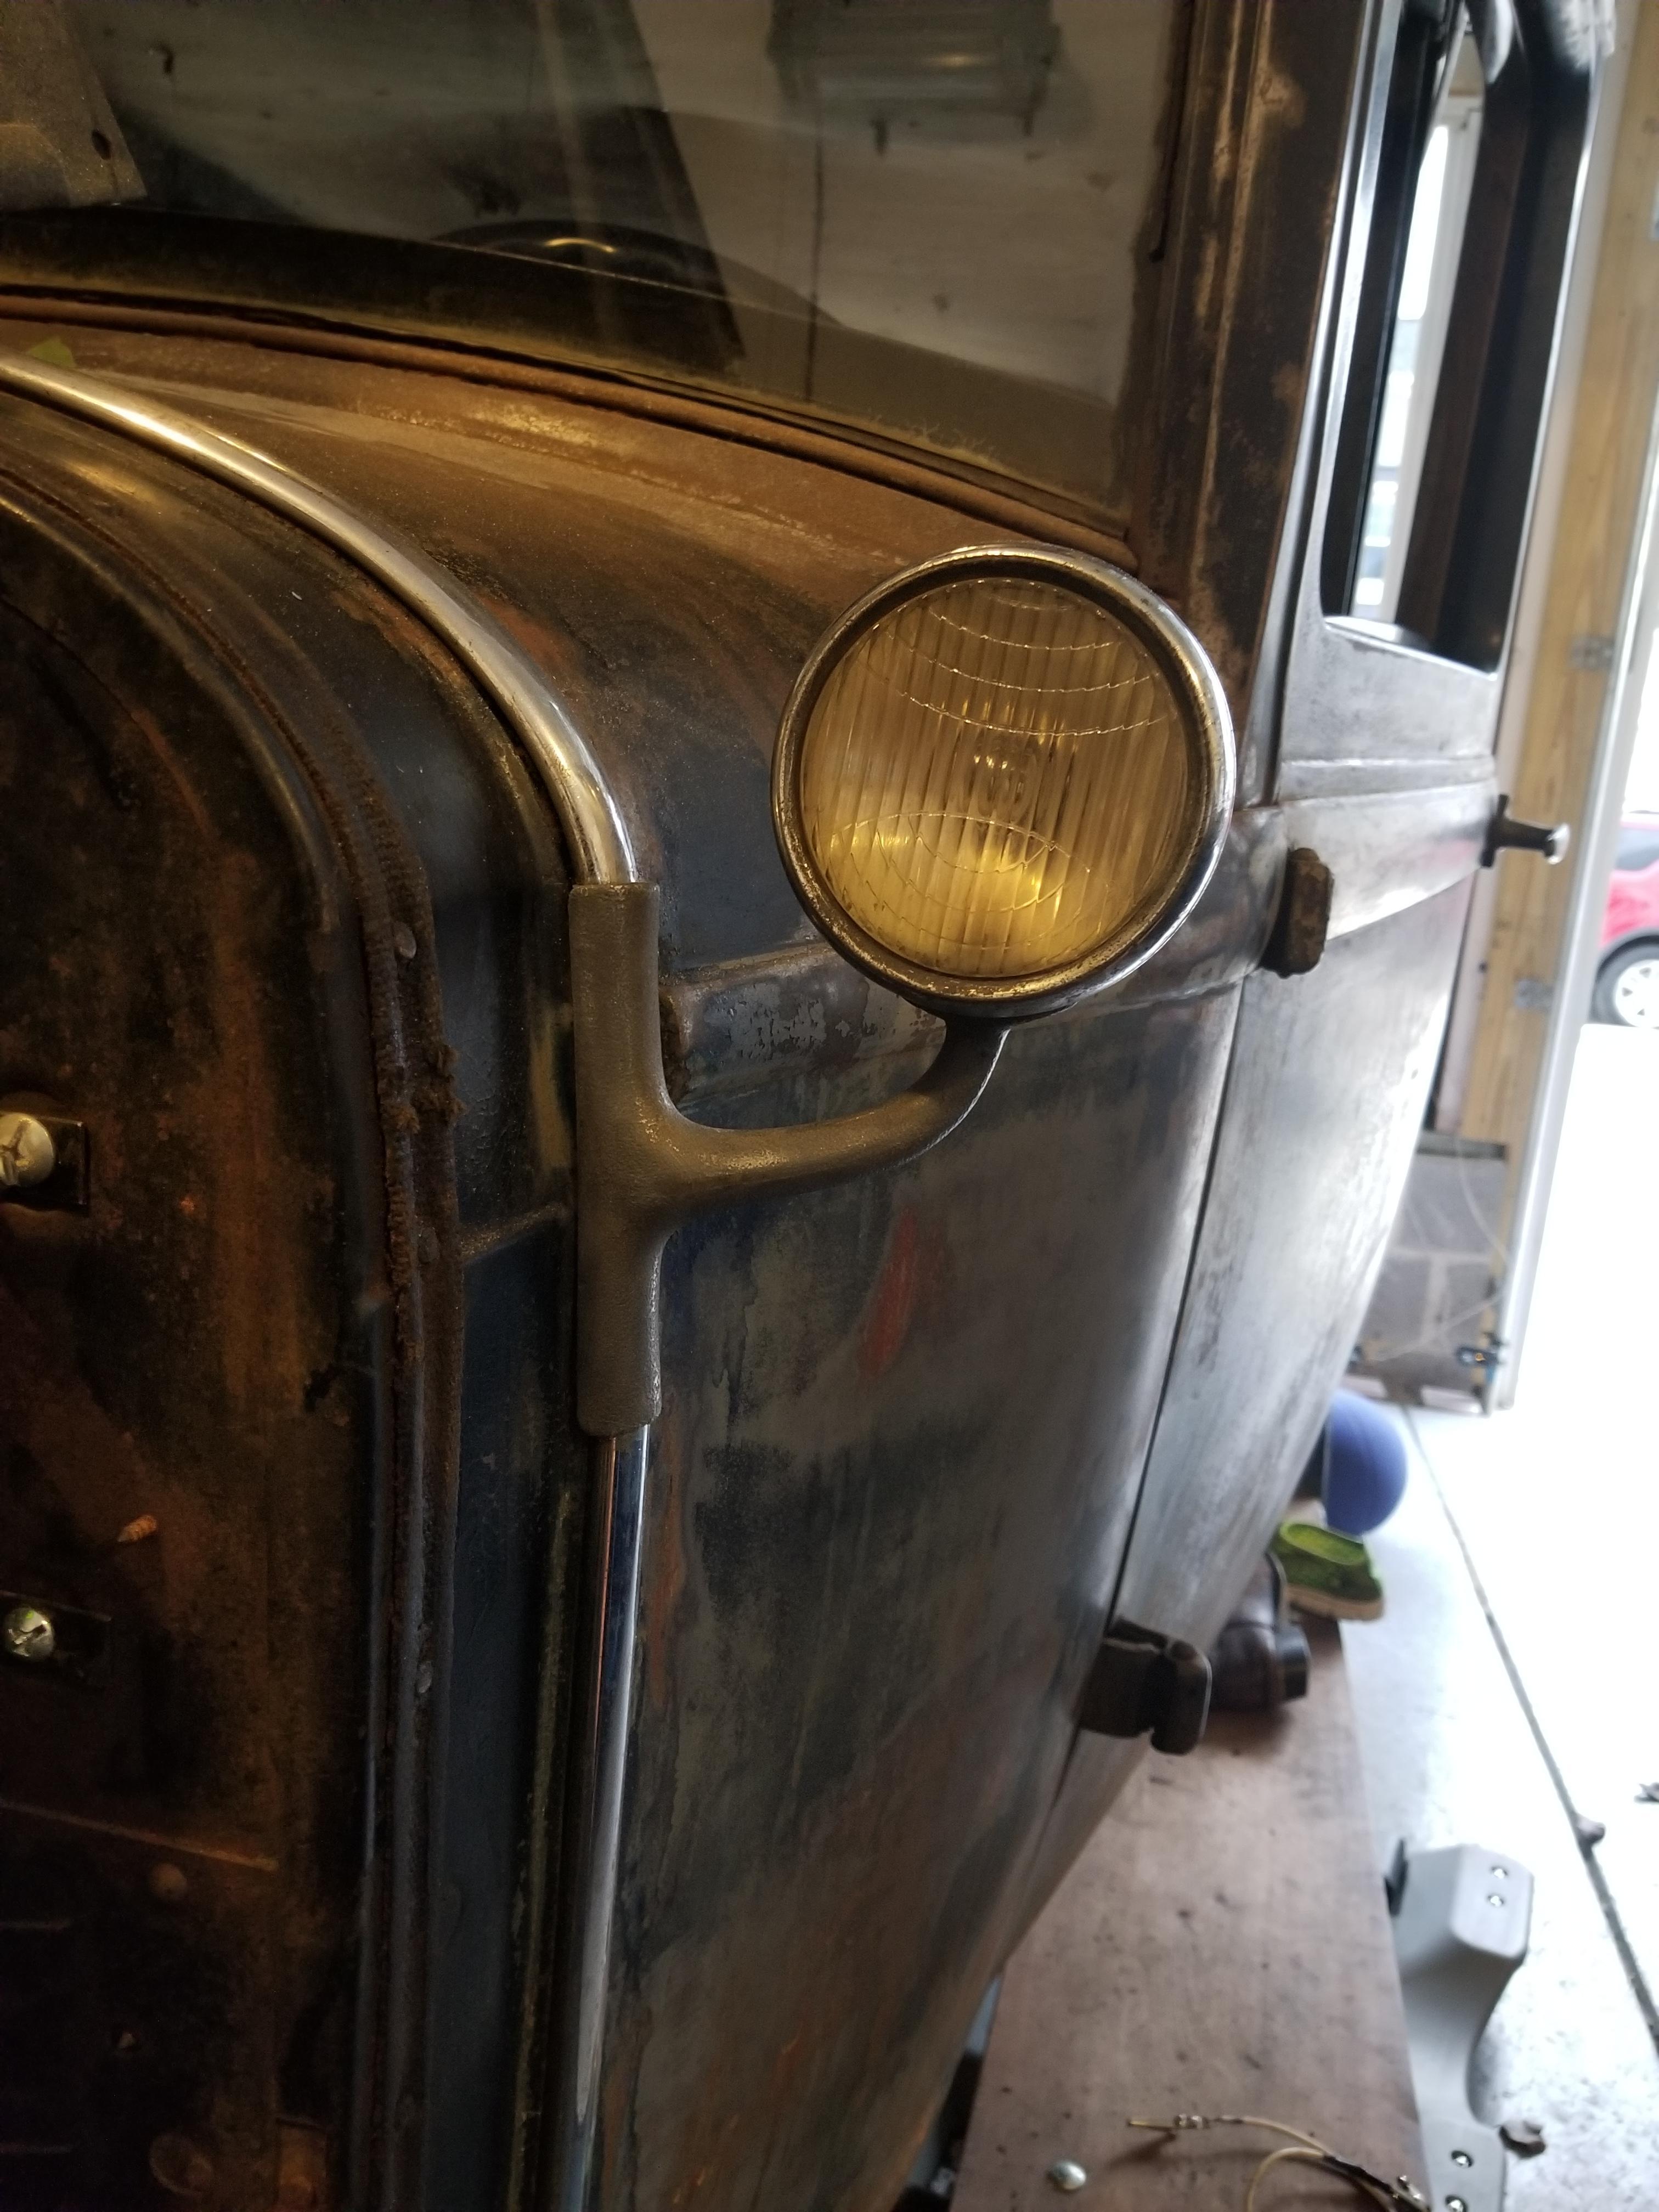 1929 DeSoto Cowl Light - Parts Wanted - Antique Automobile Club of ...